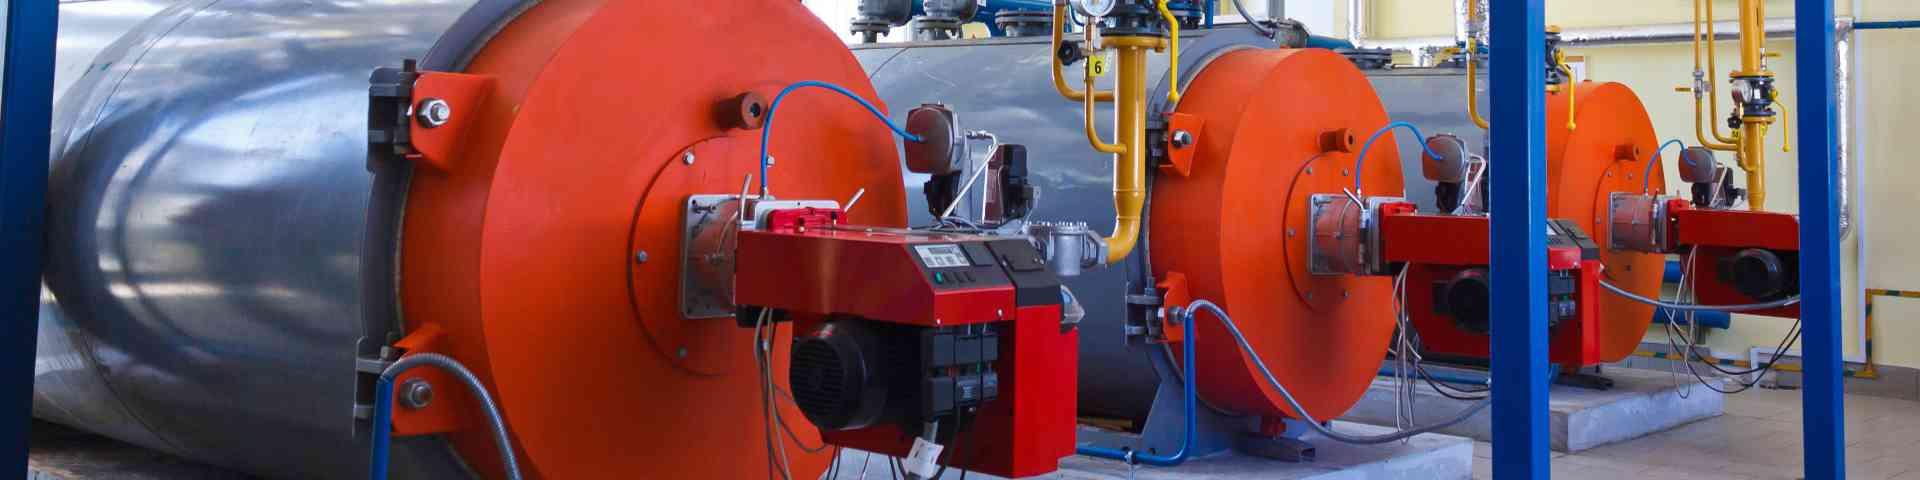 Vattenfall wil mega boiler voor stadsverwarming